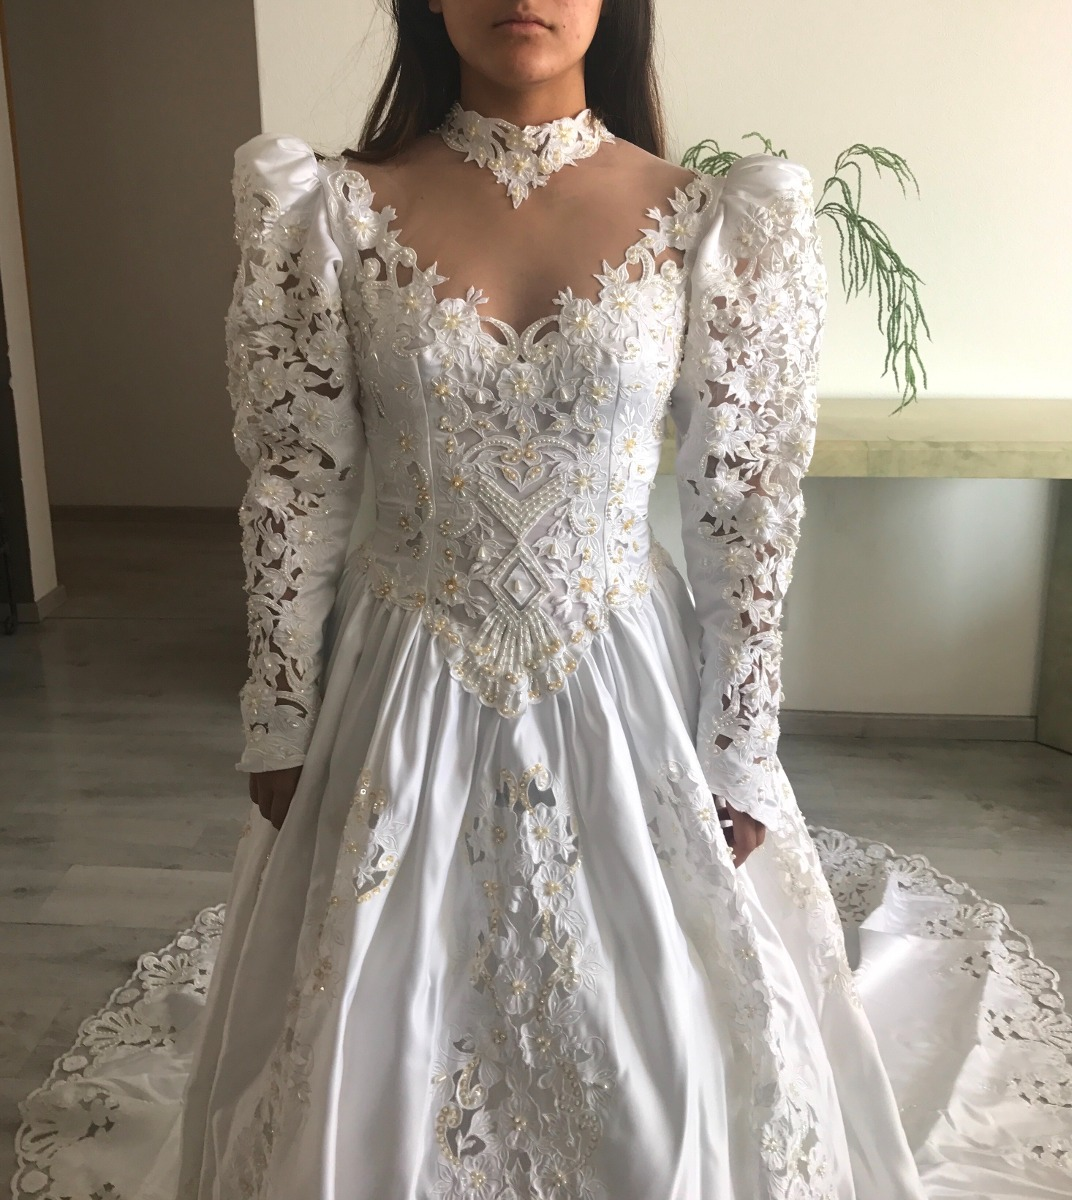 Asombroso Vestido De Novia De Encaje Usada Bosquejo - Ideas de ...